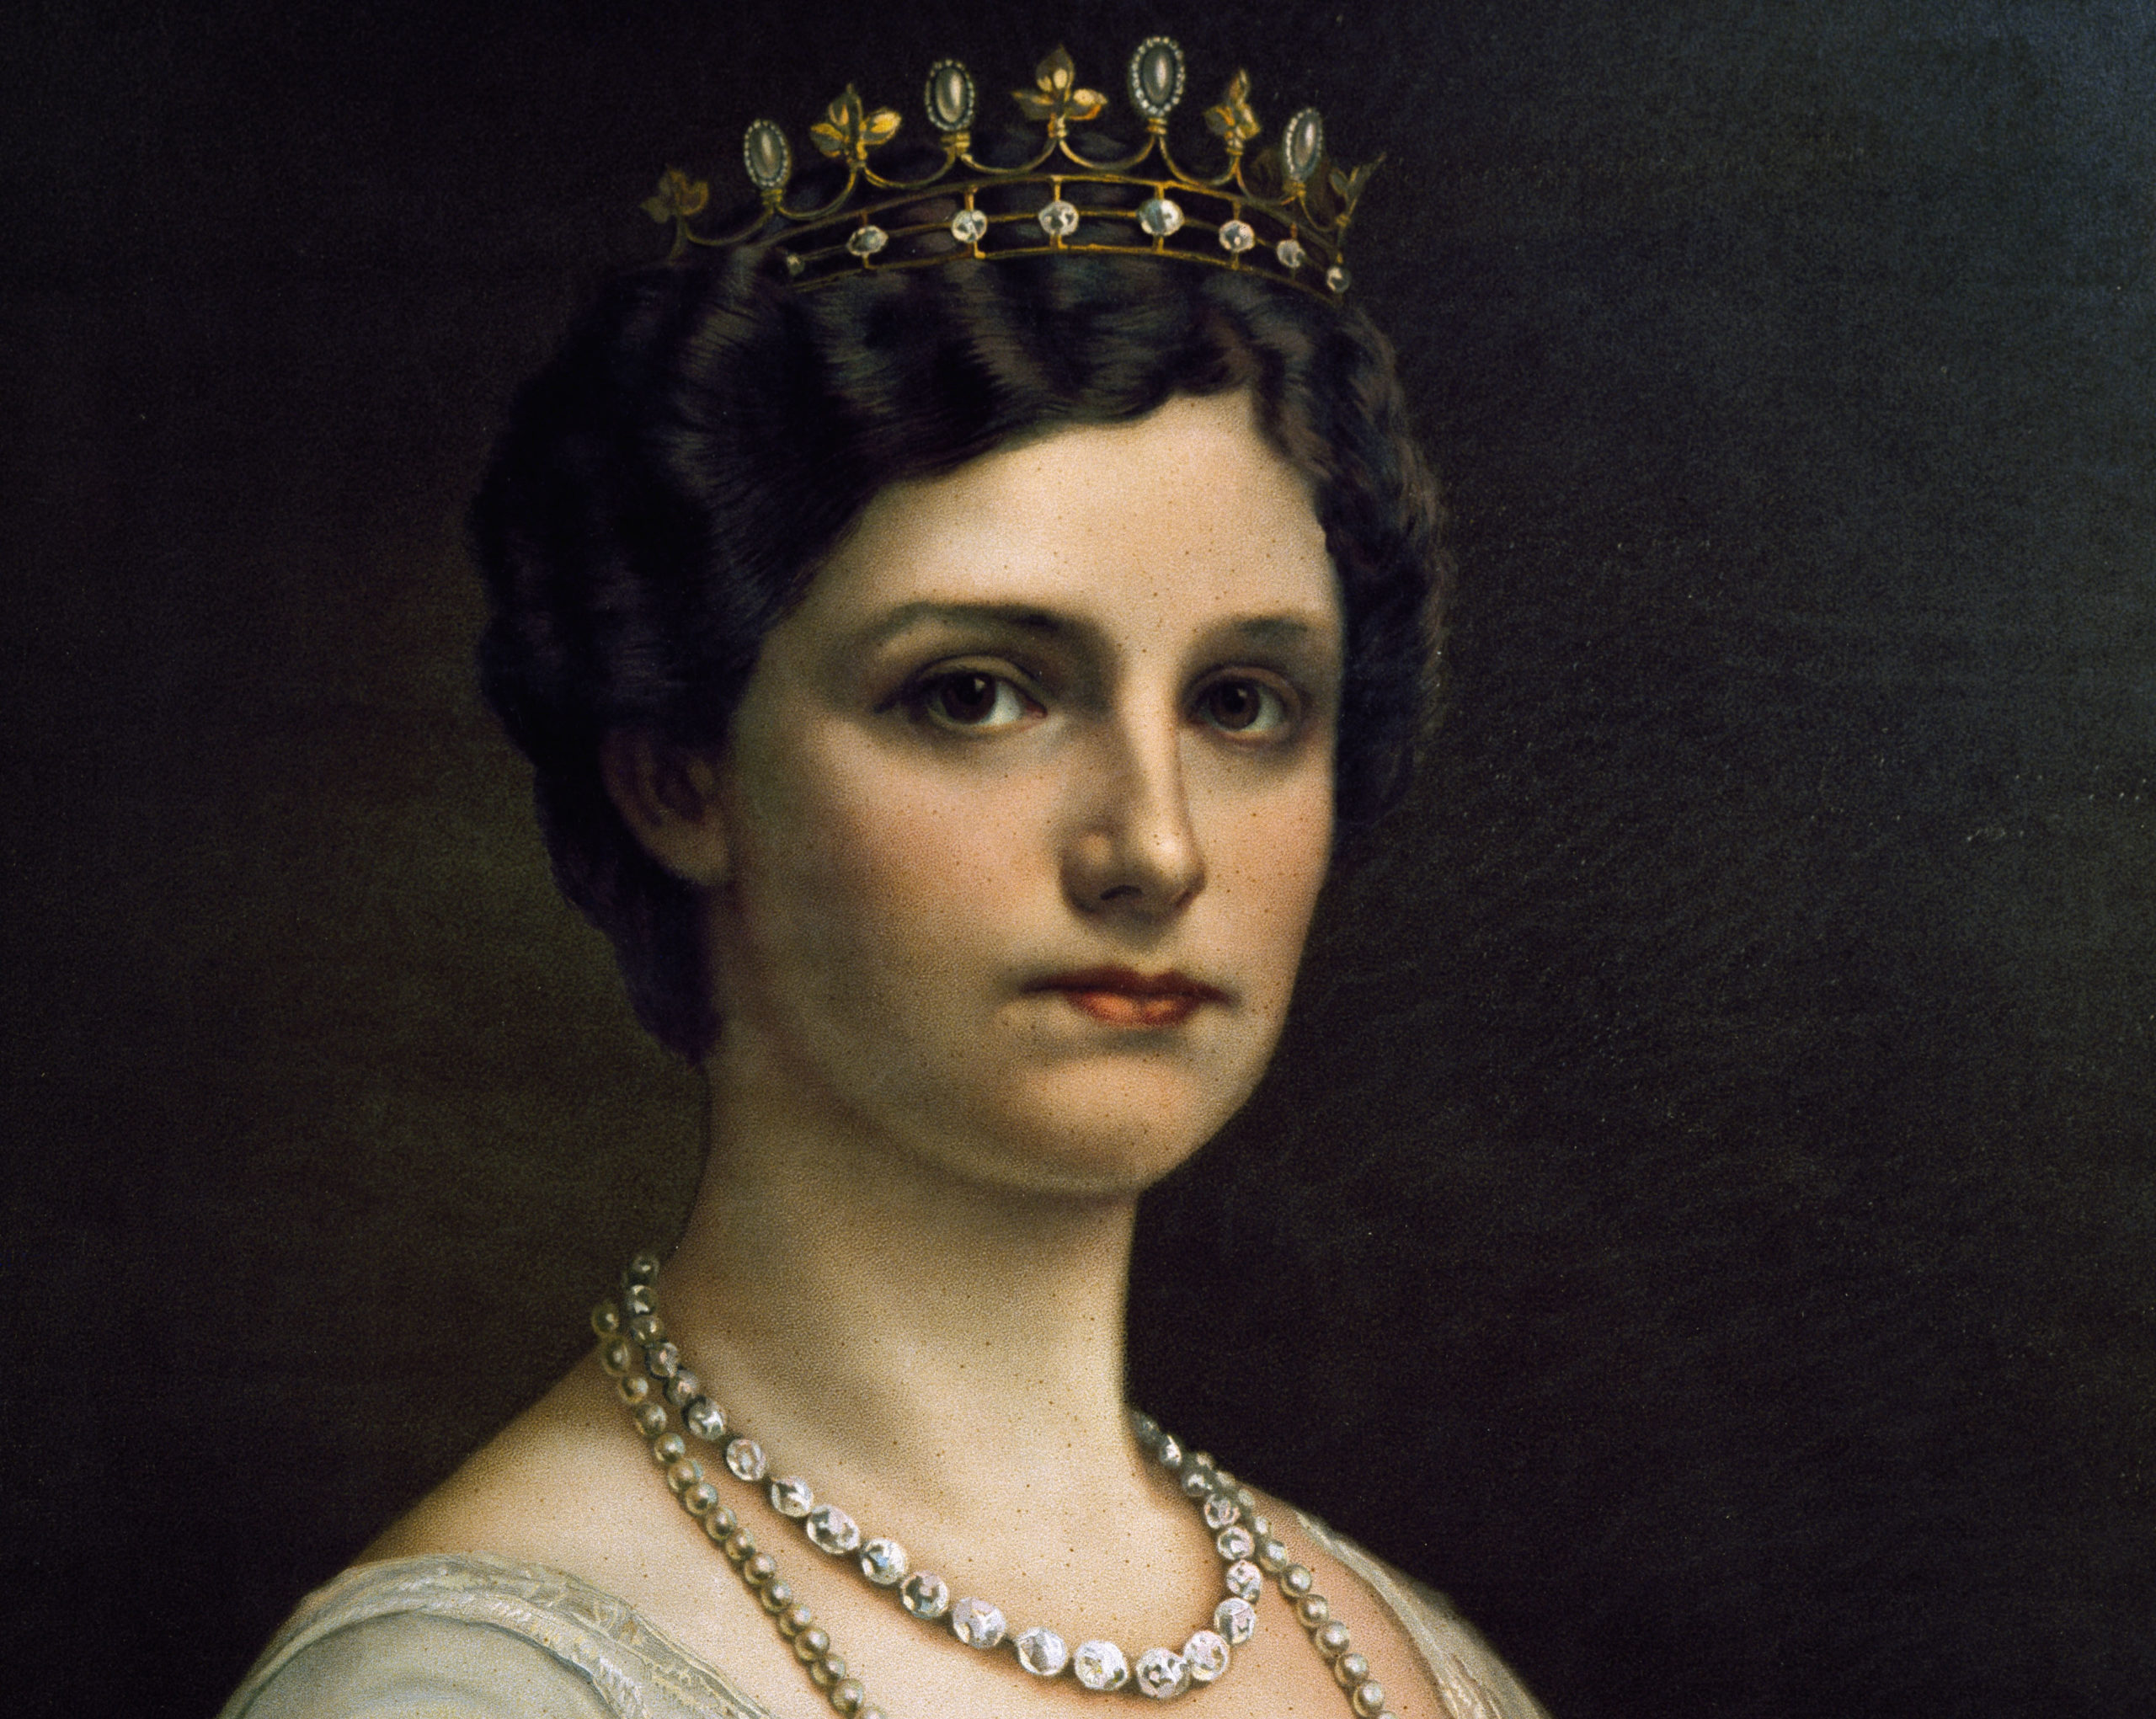 Zita Of Bourbon-Parma facts